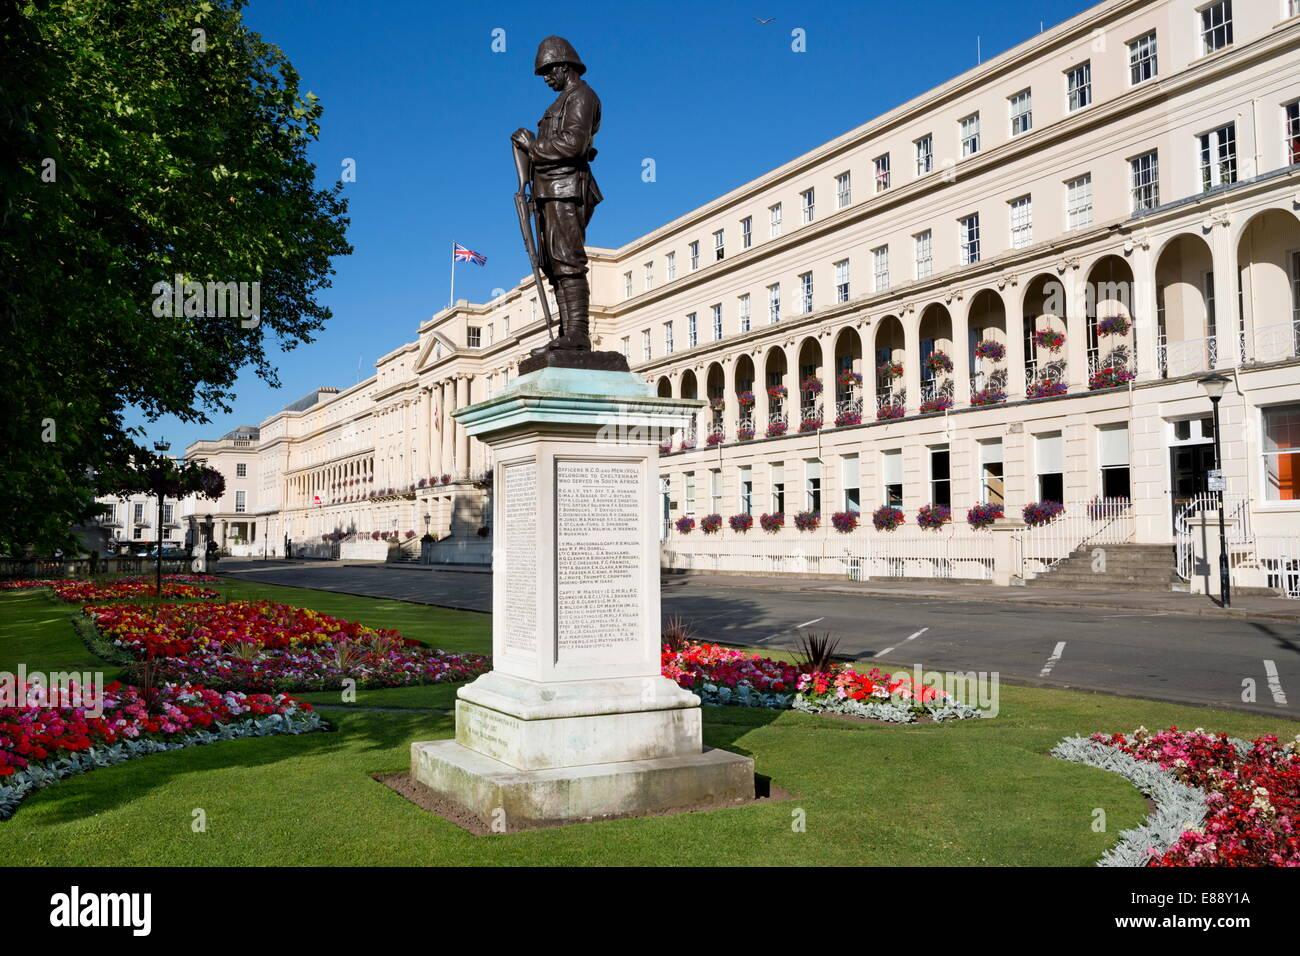 Boer War Memorial and Municipal Offices, The Promenade, Cheltenham, Gloucestershire, England, United Kingdom, Europe - Stock Image